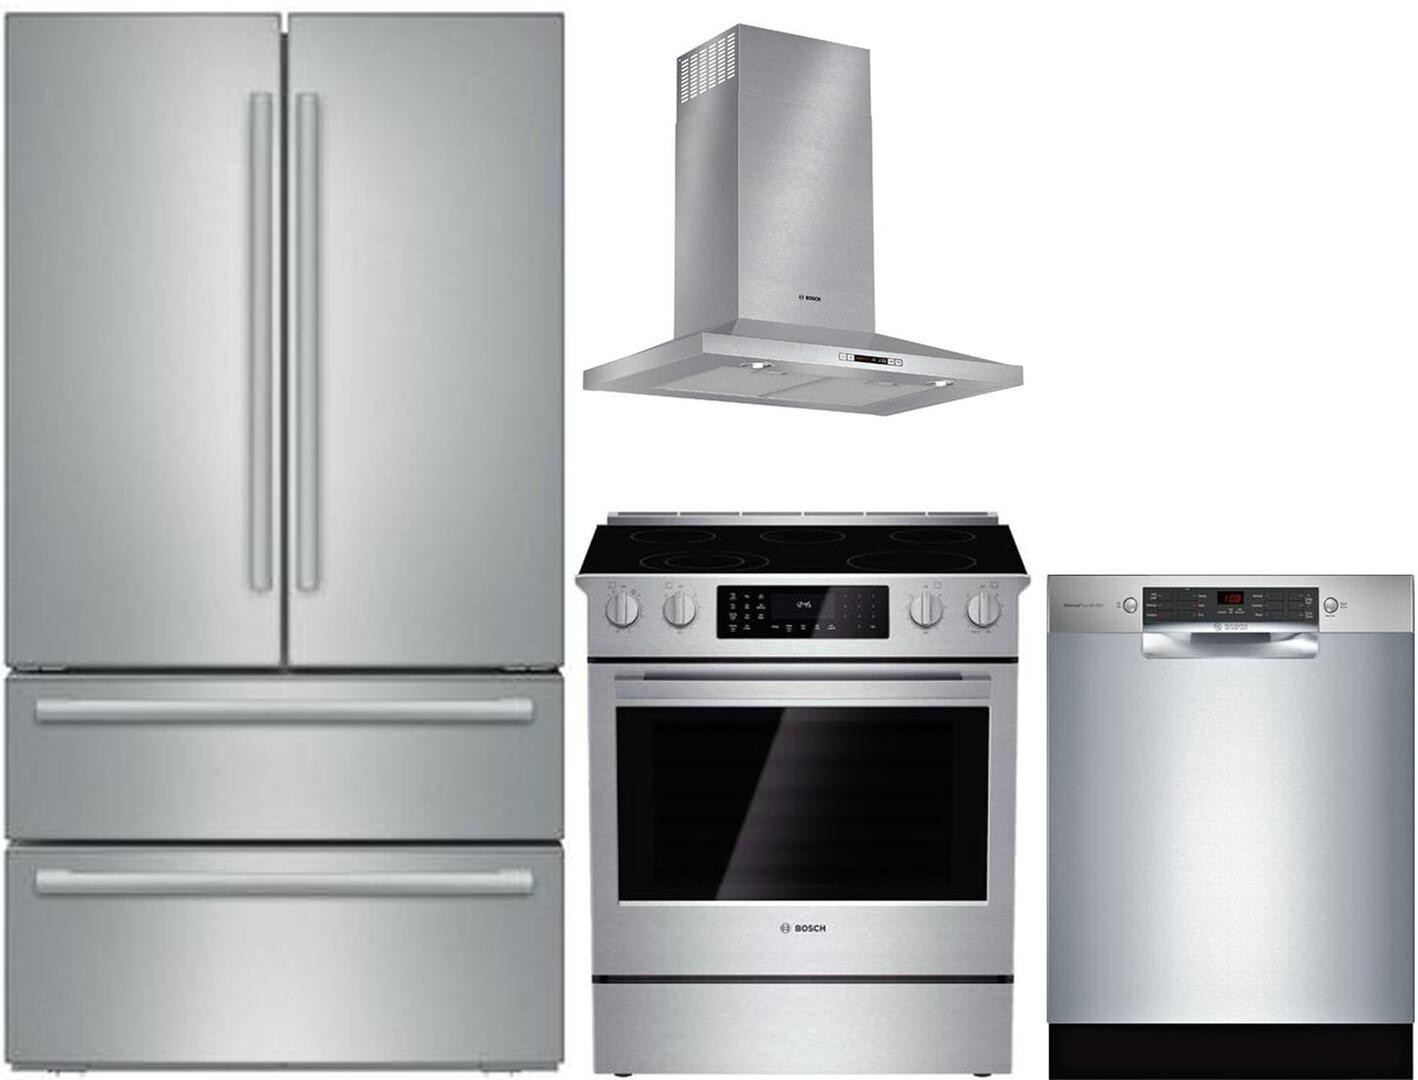 Bosch 741727 800 Kitchen Appliance Packages Appliances